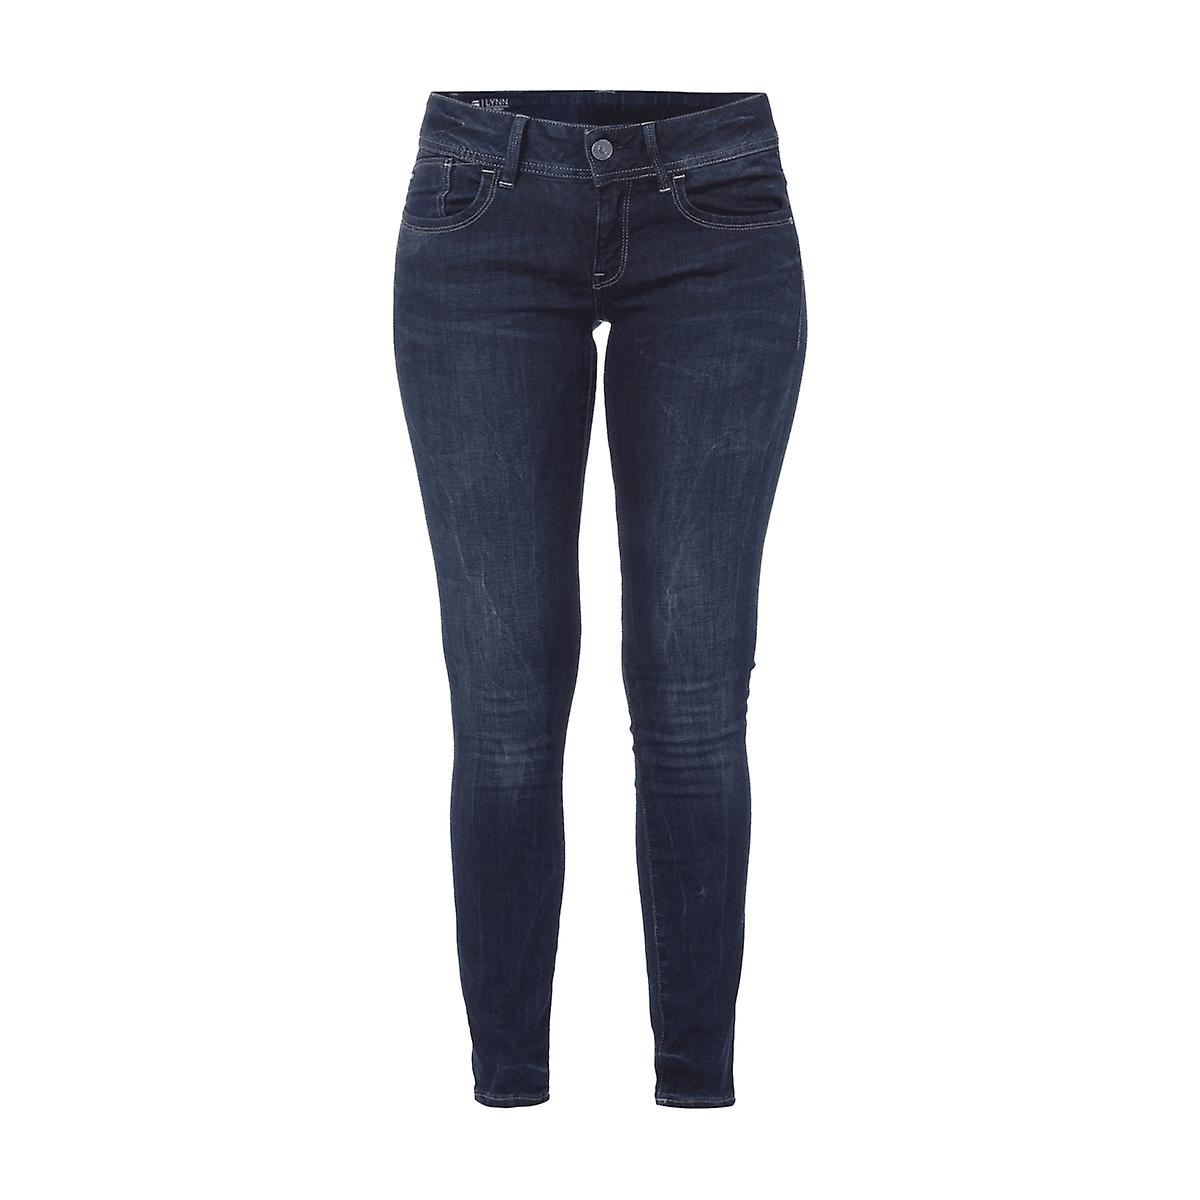 G-Star RAW Stone Washed Skinny Fit Jeans Damen Hose Denim Blau